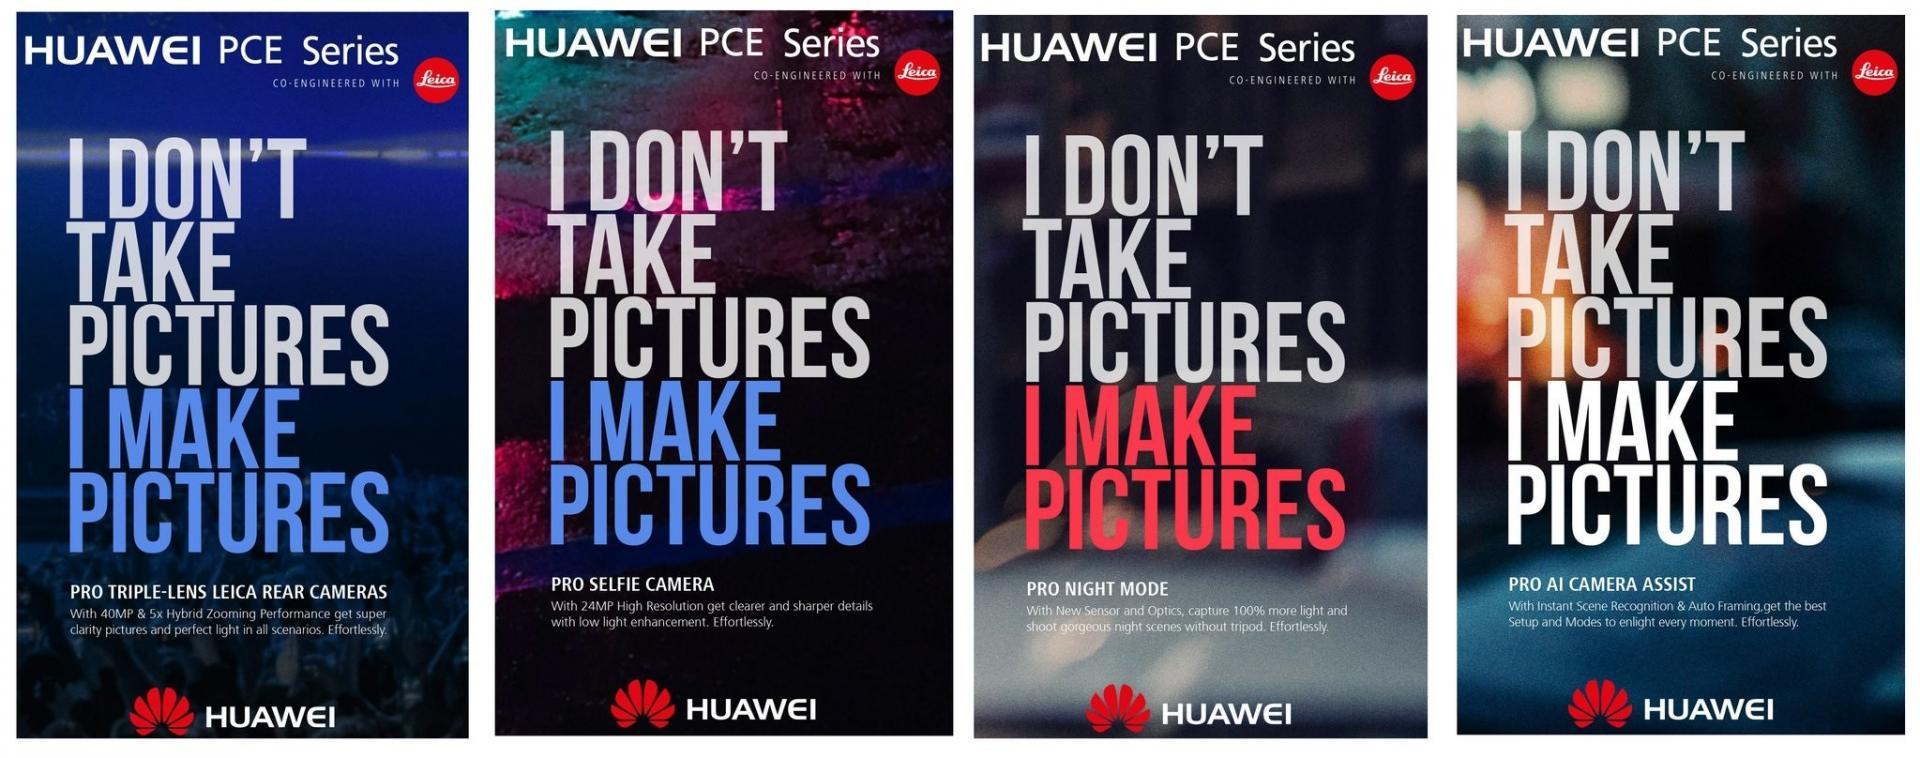 huawei pce series